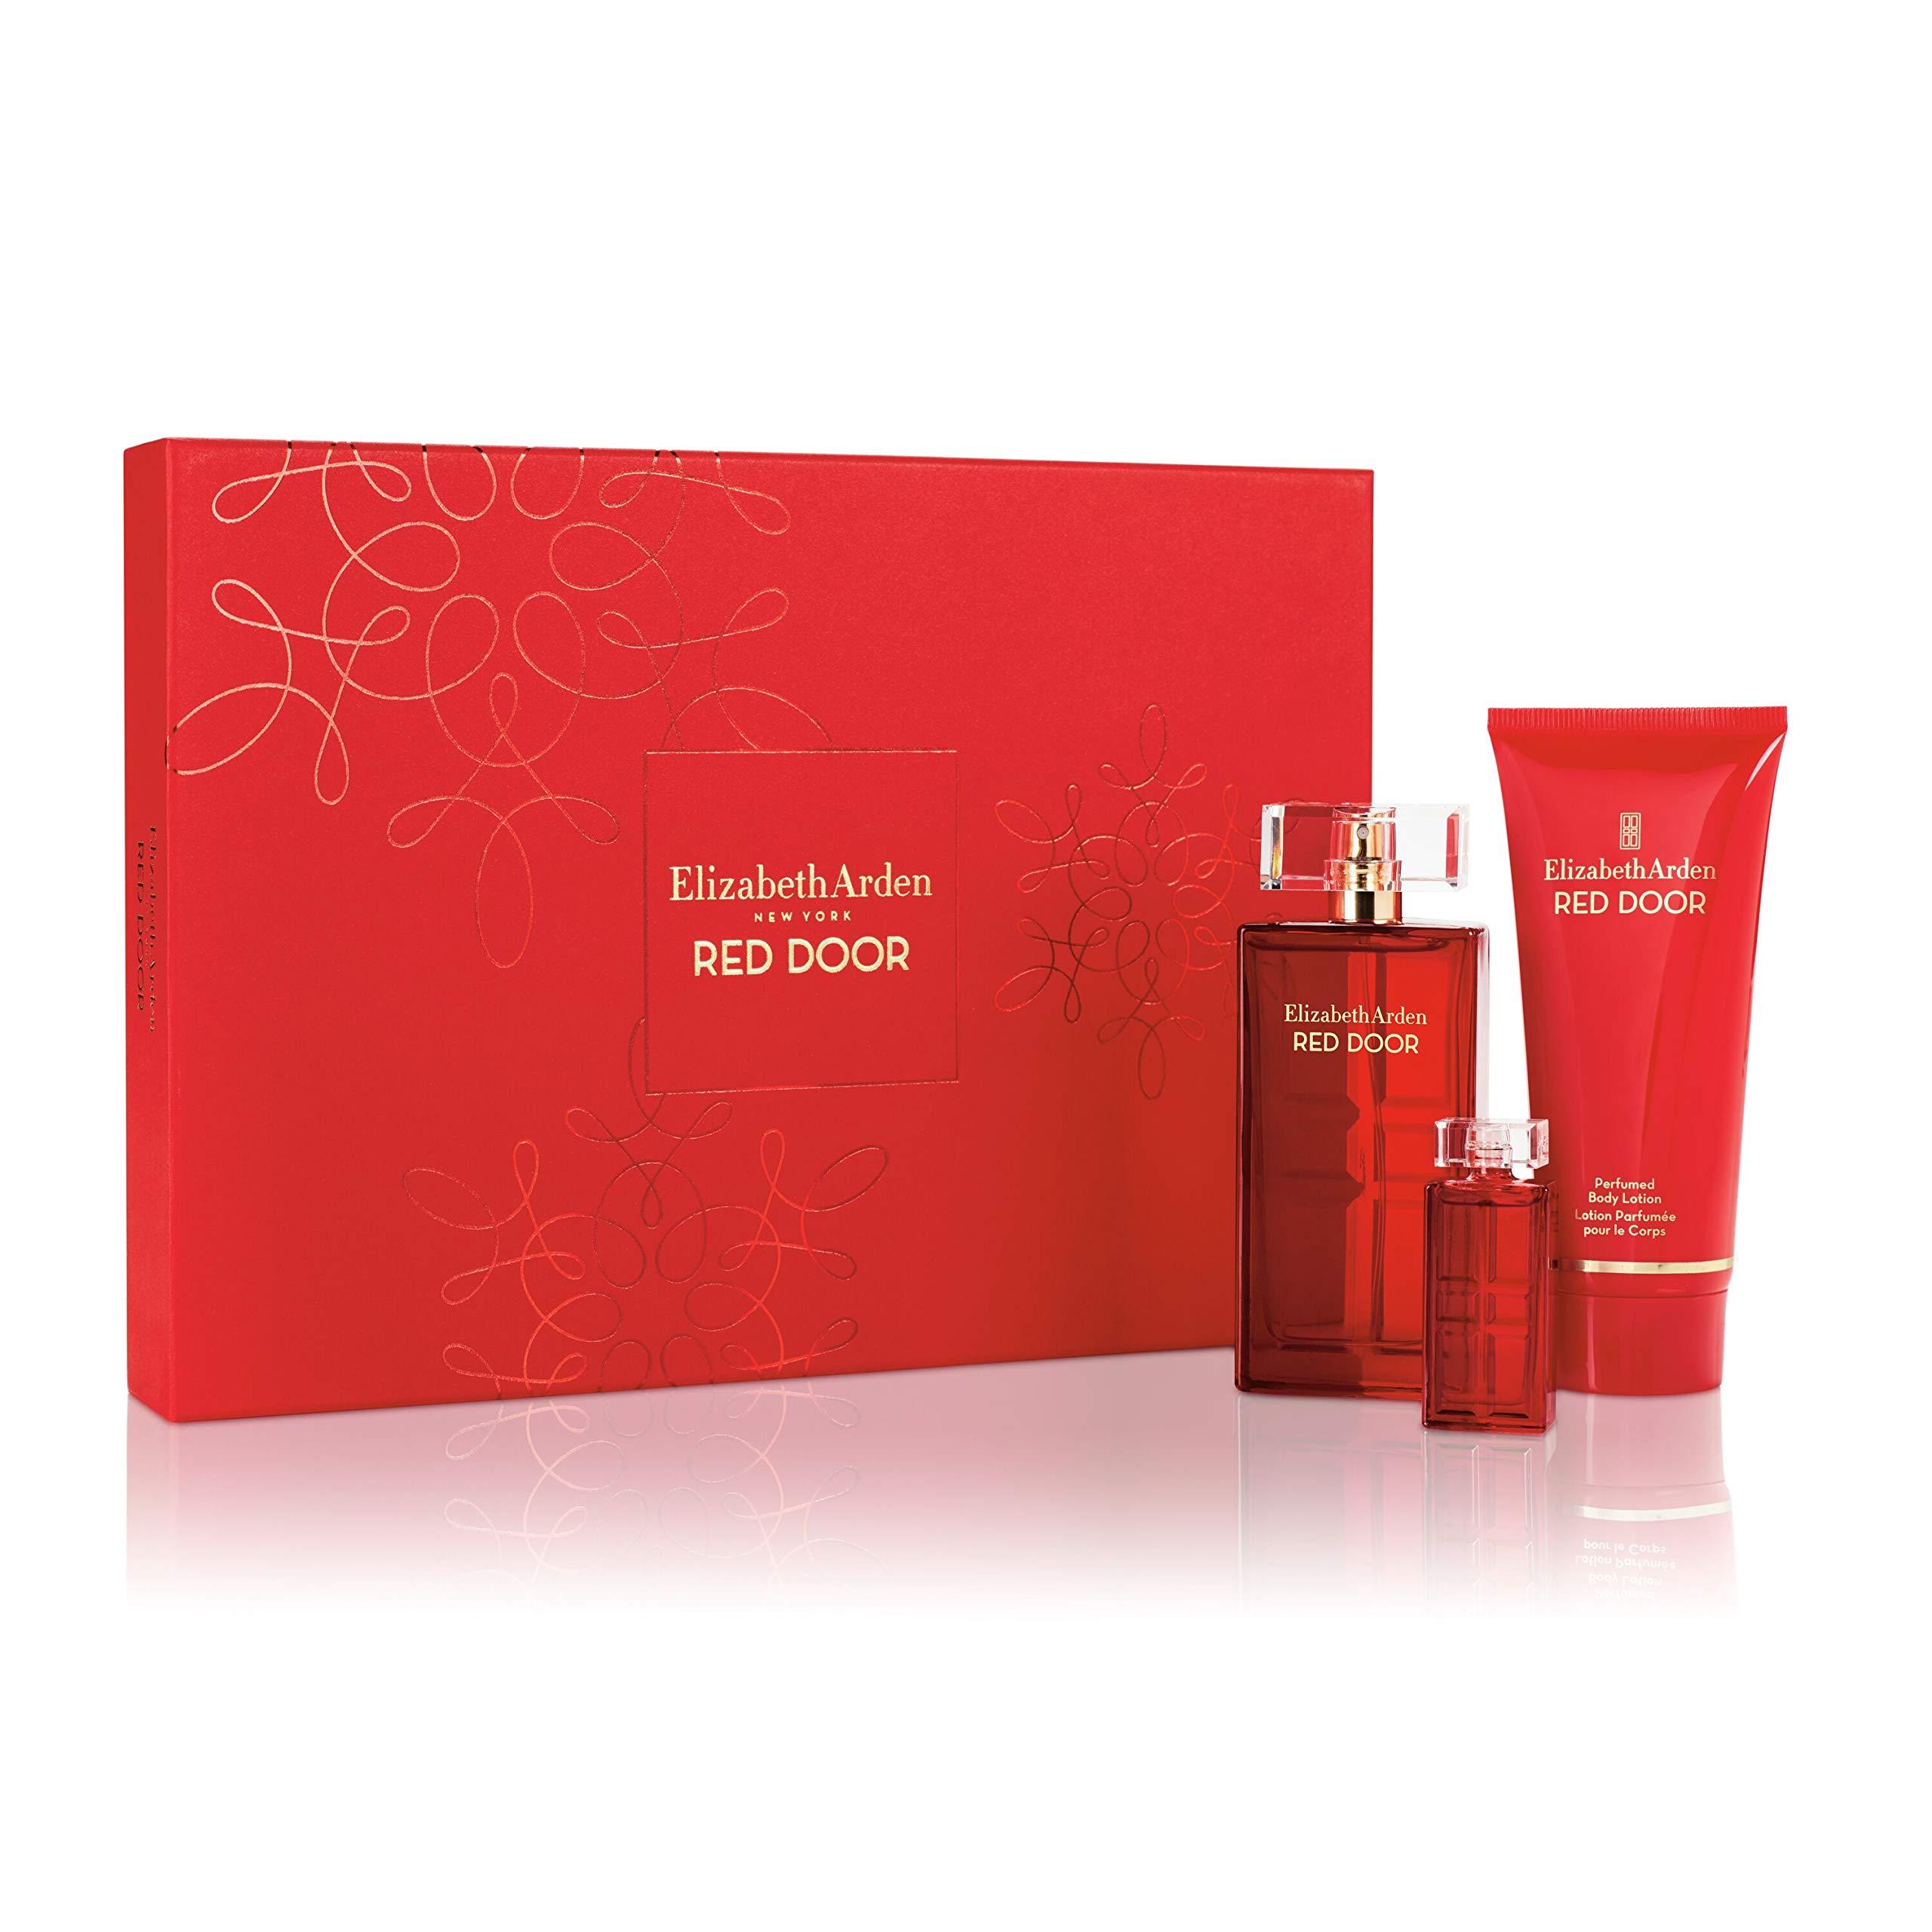 Elizabeth Arden Red Door 1.7 oz 3 Piece Fragrance Gift Set, Perfume for Women, 3 ct. by Elizabeth Arden